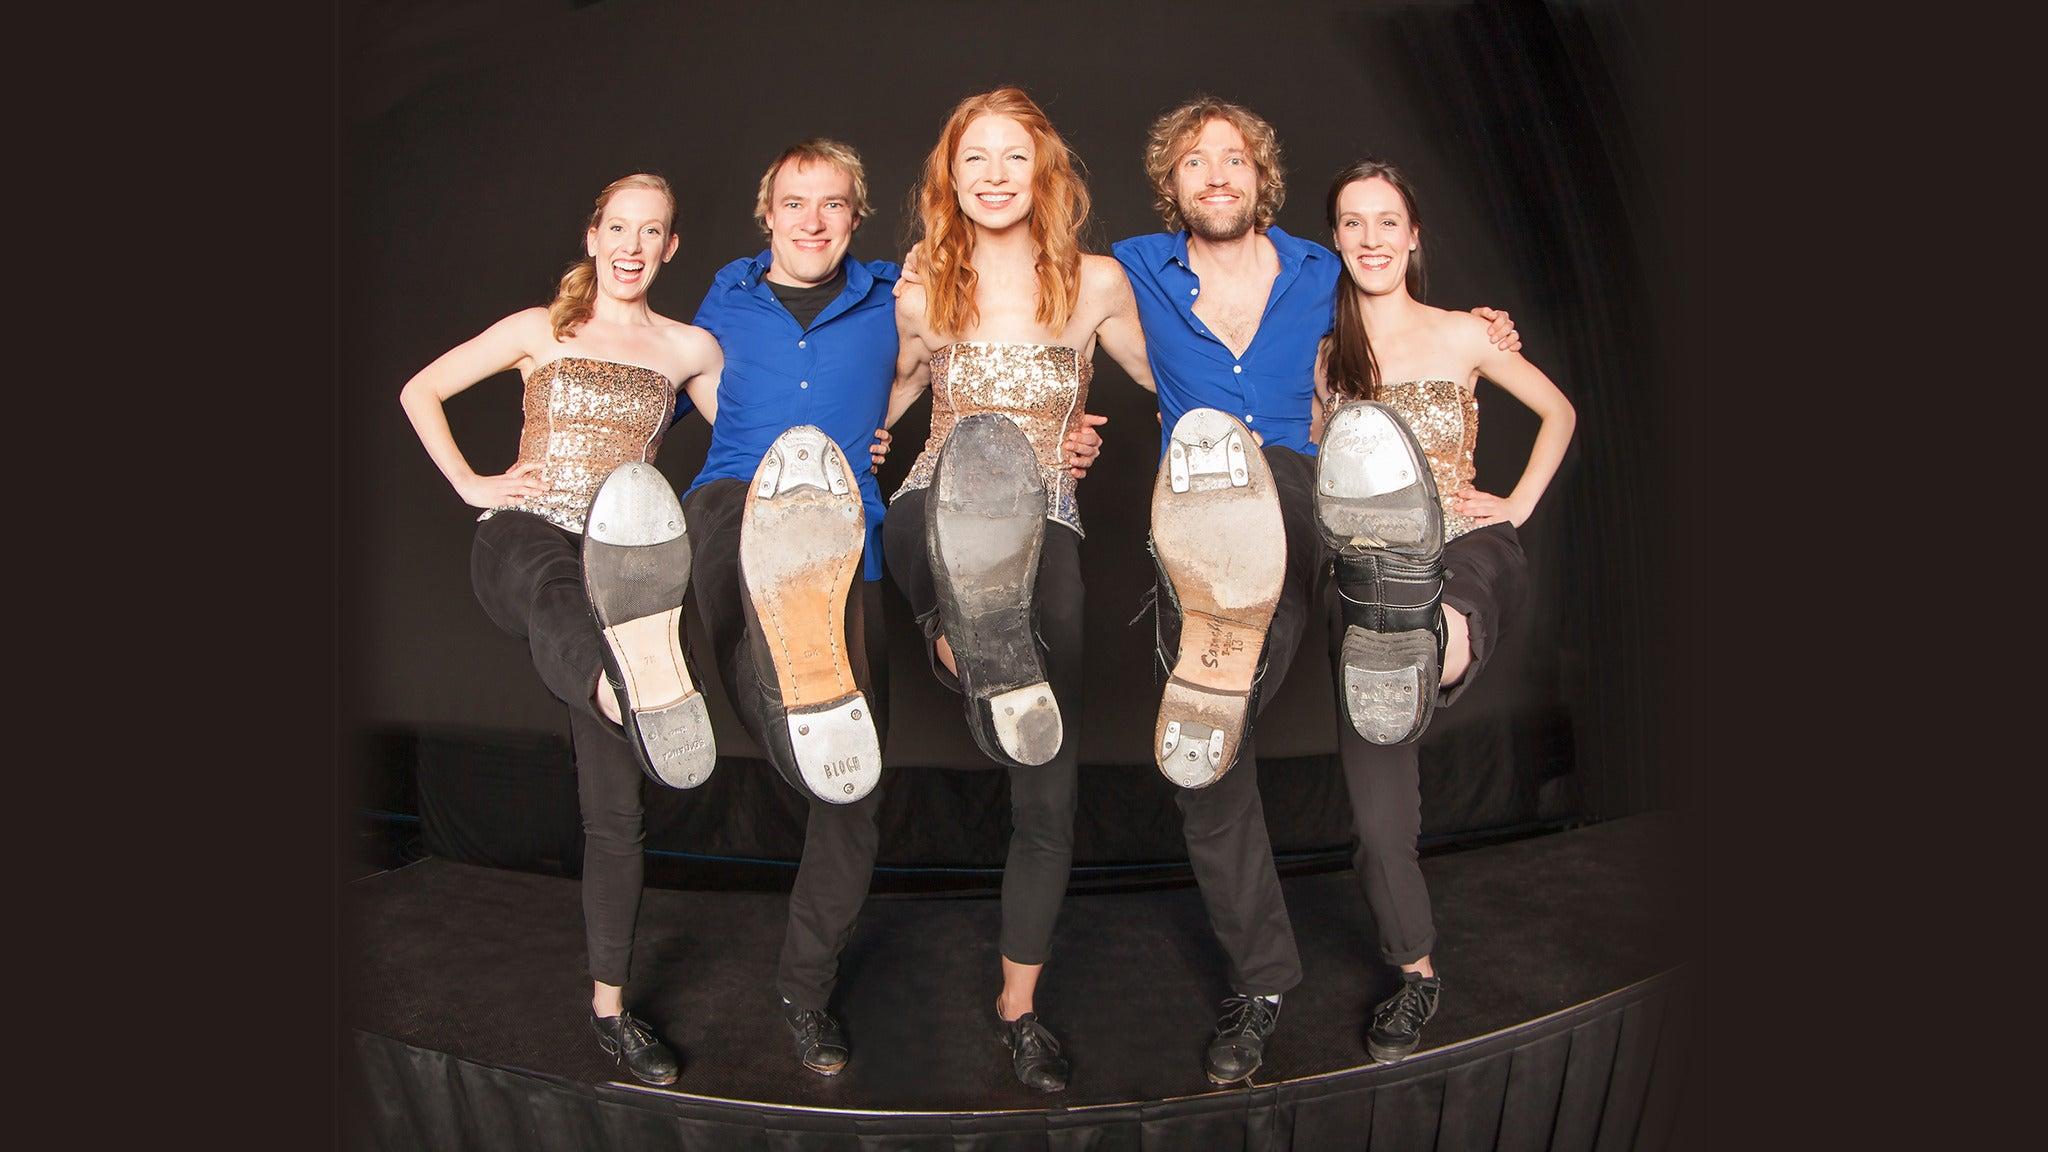 The StepCrew at Parker Playhouse - Ft Lauderdale, FL 33304